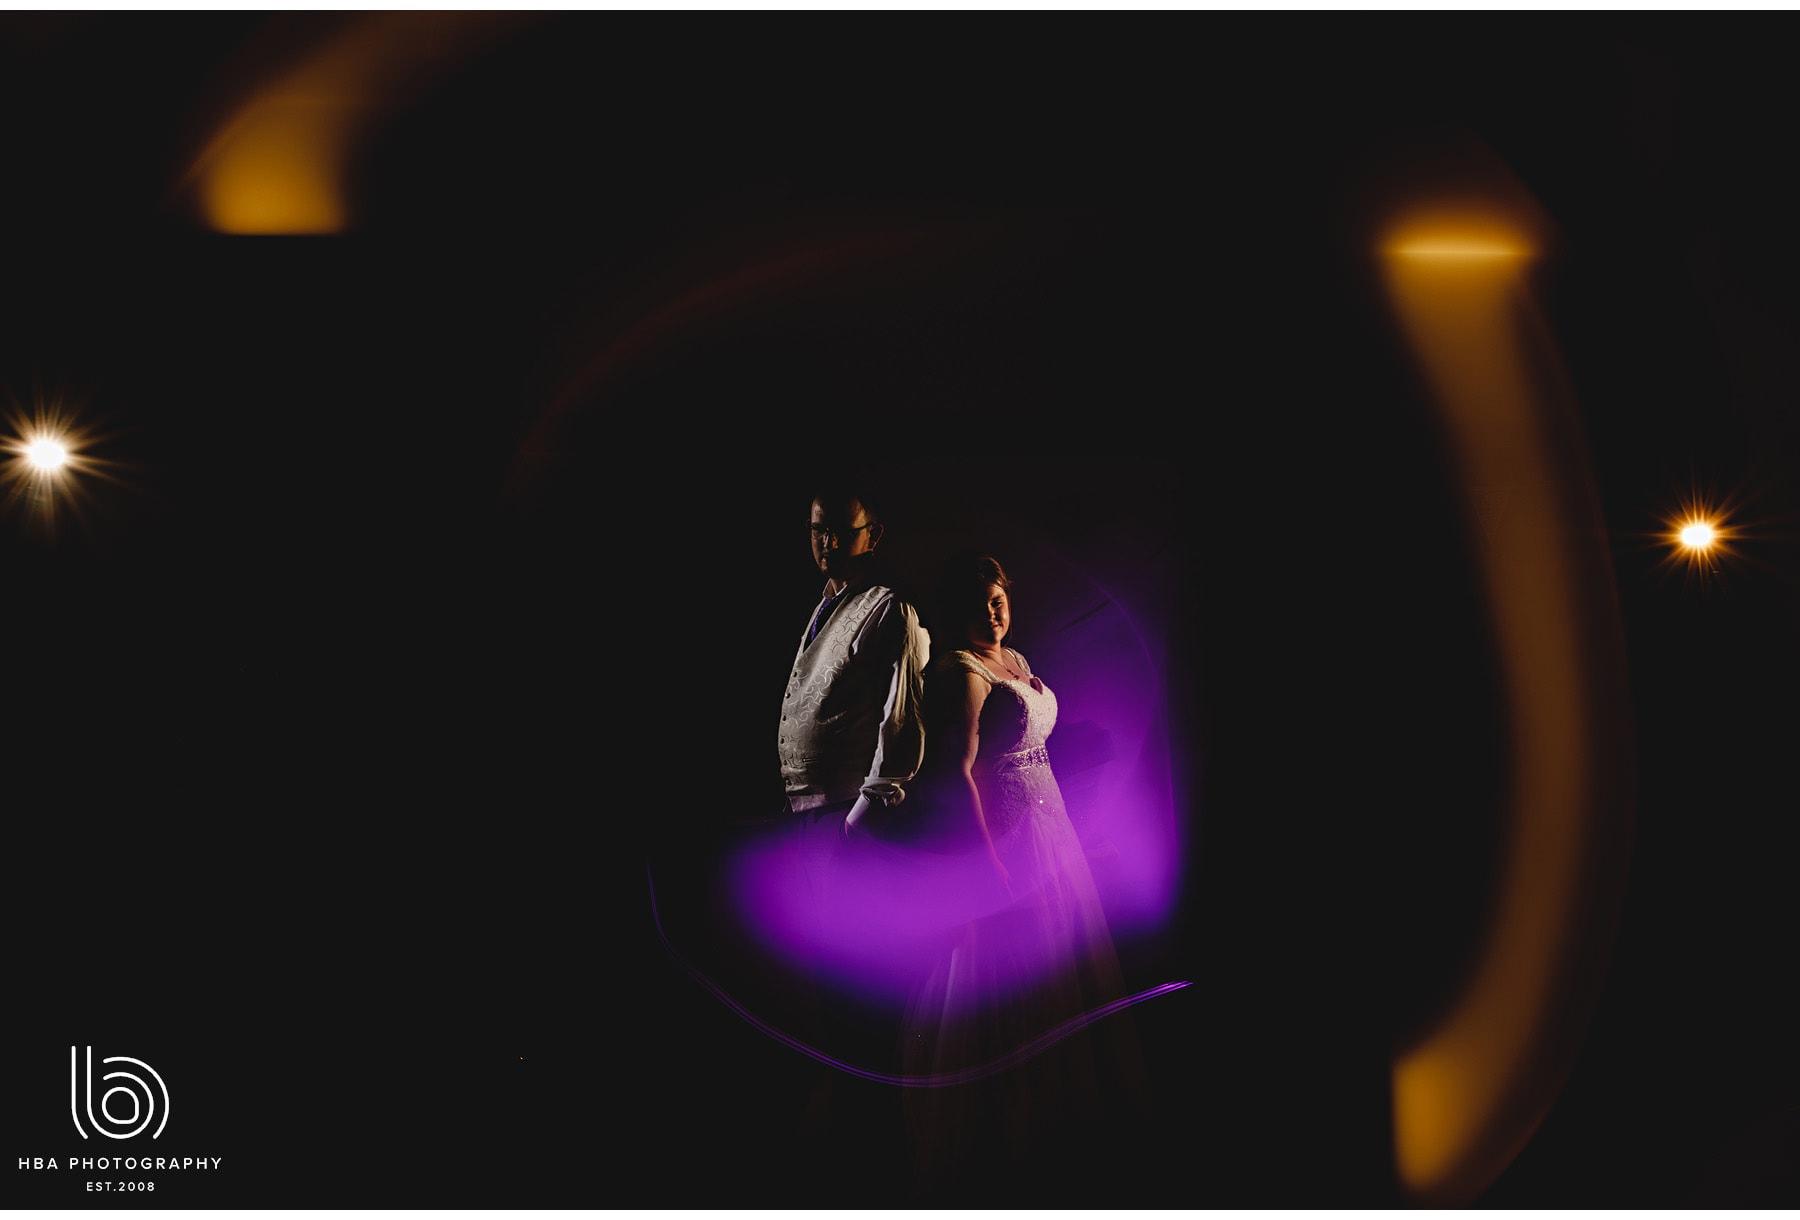 the bride & groom in the pruple